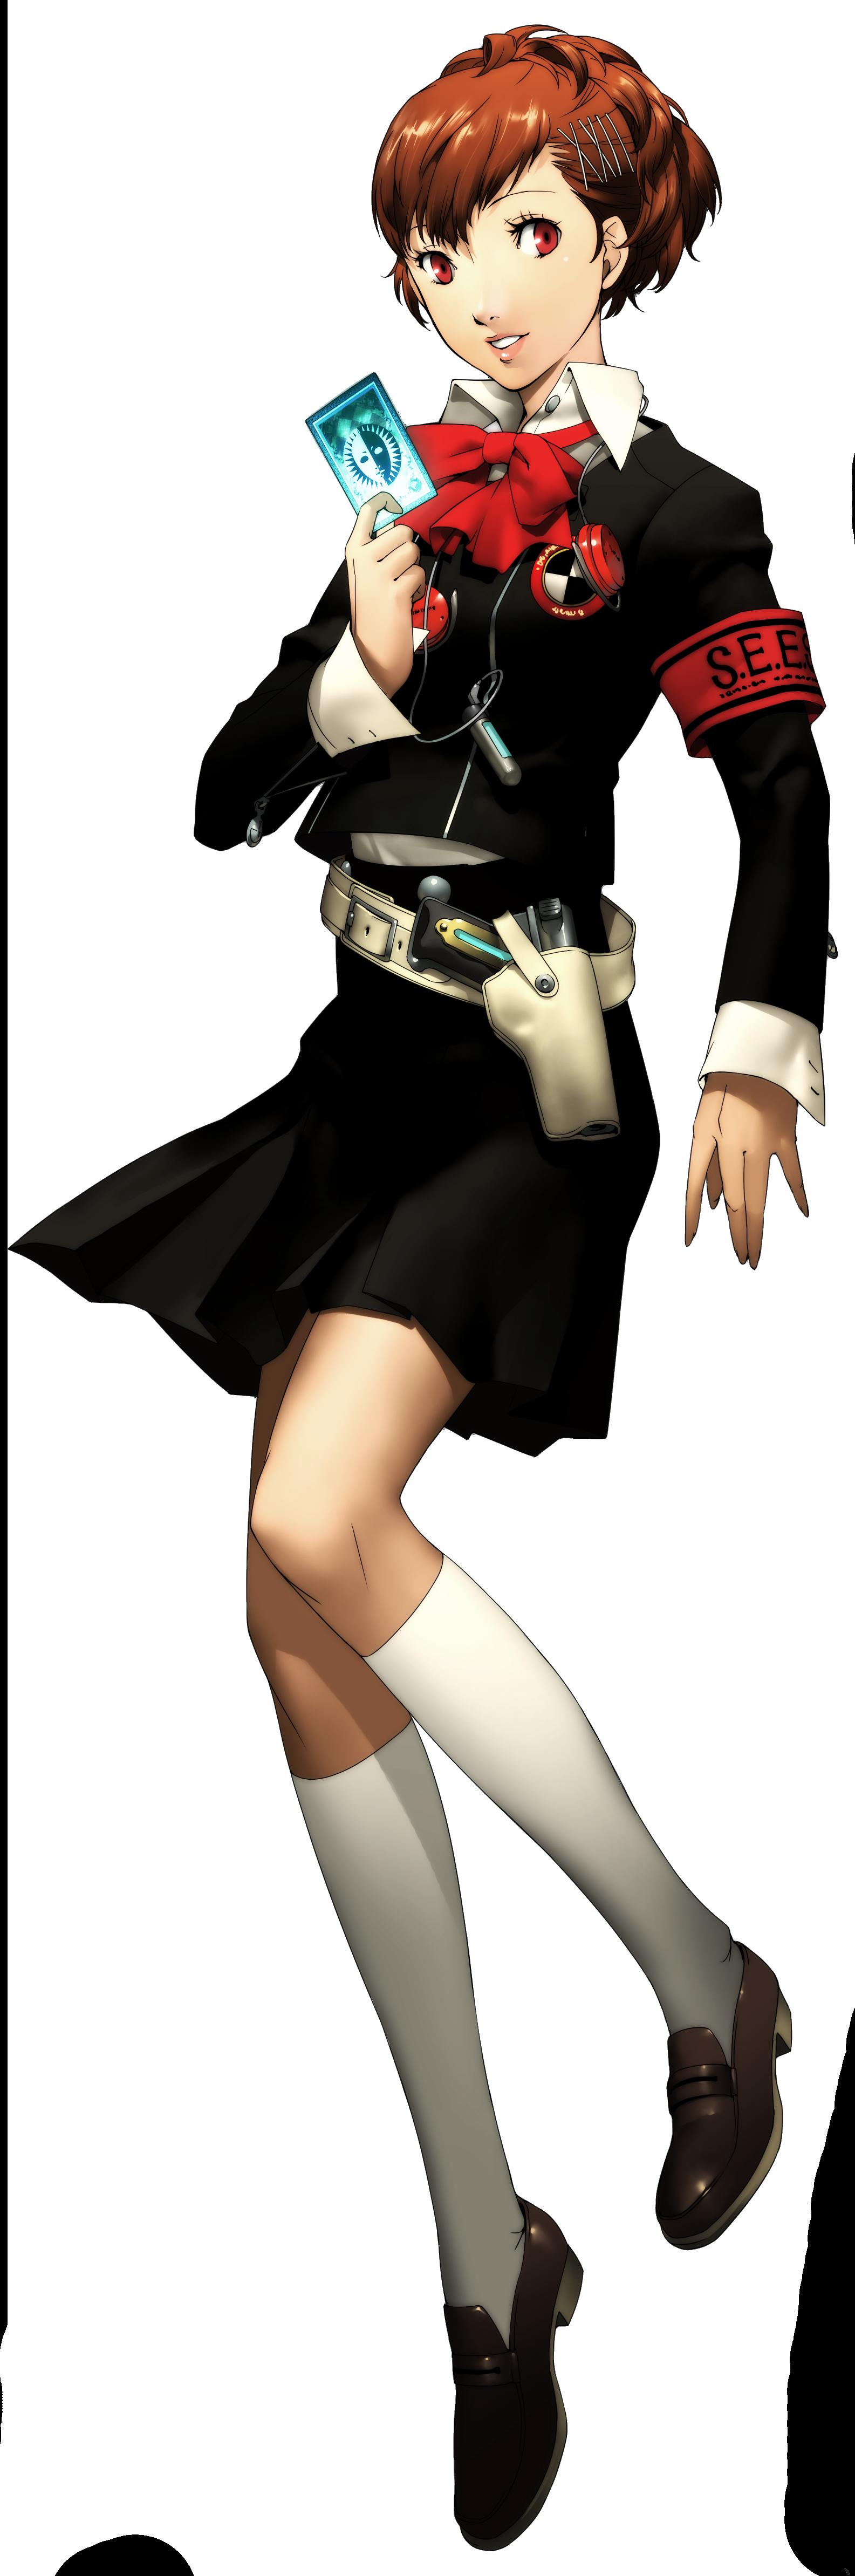 Female protagonist (Persona 3 Portable)